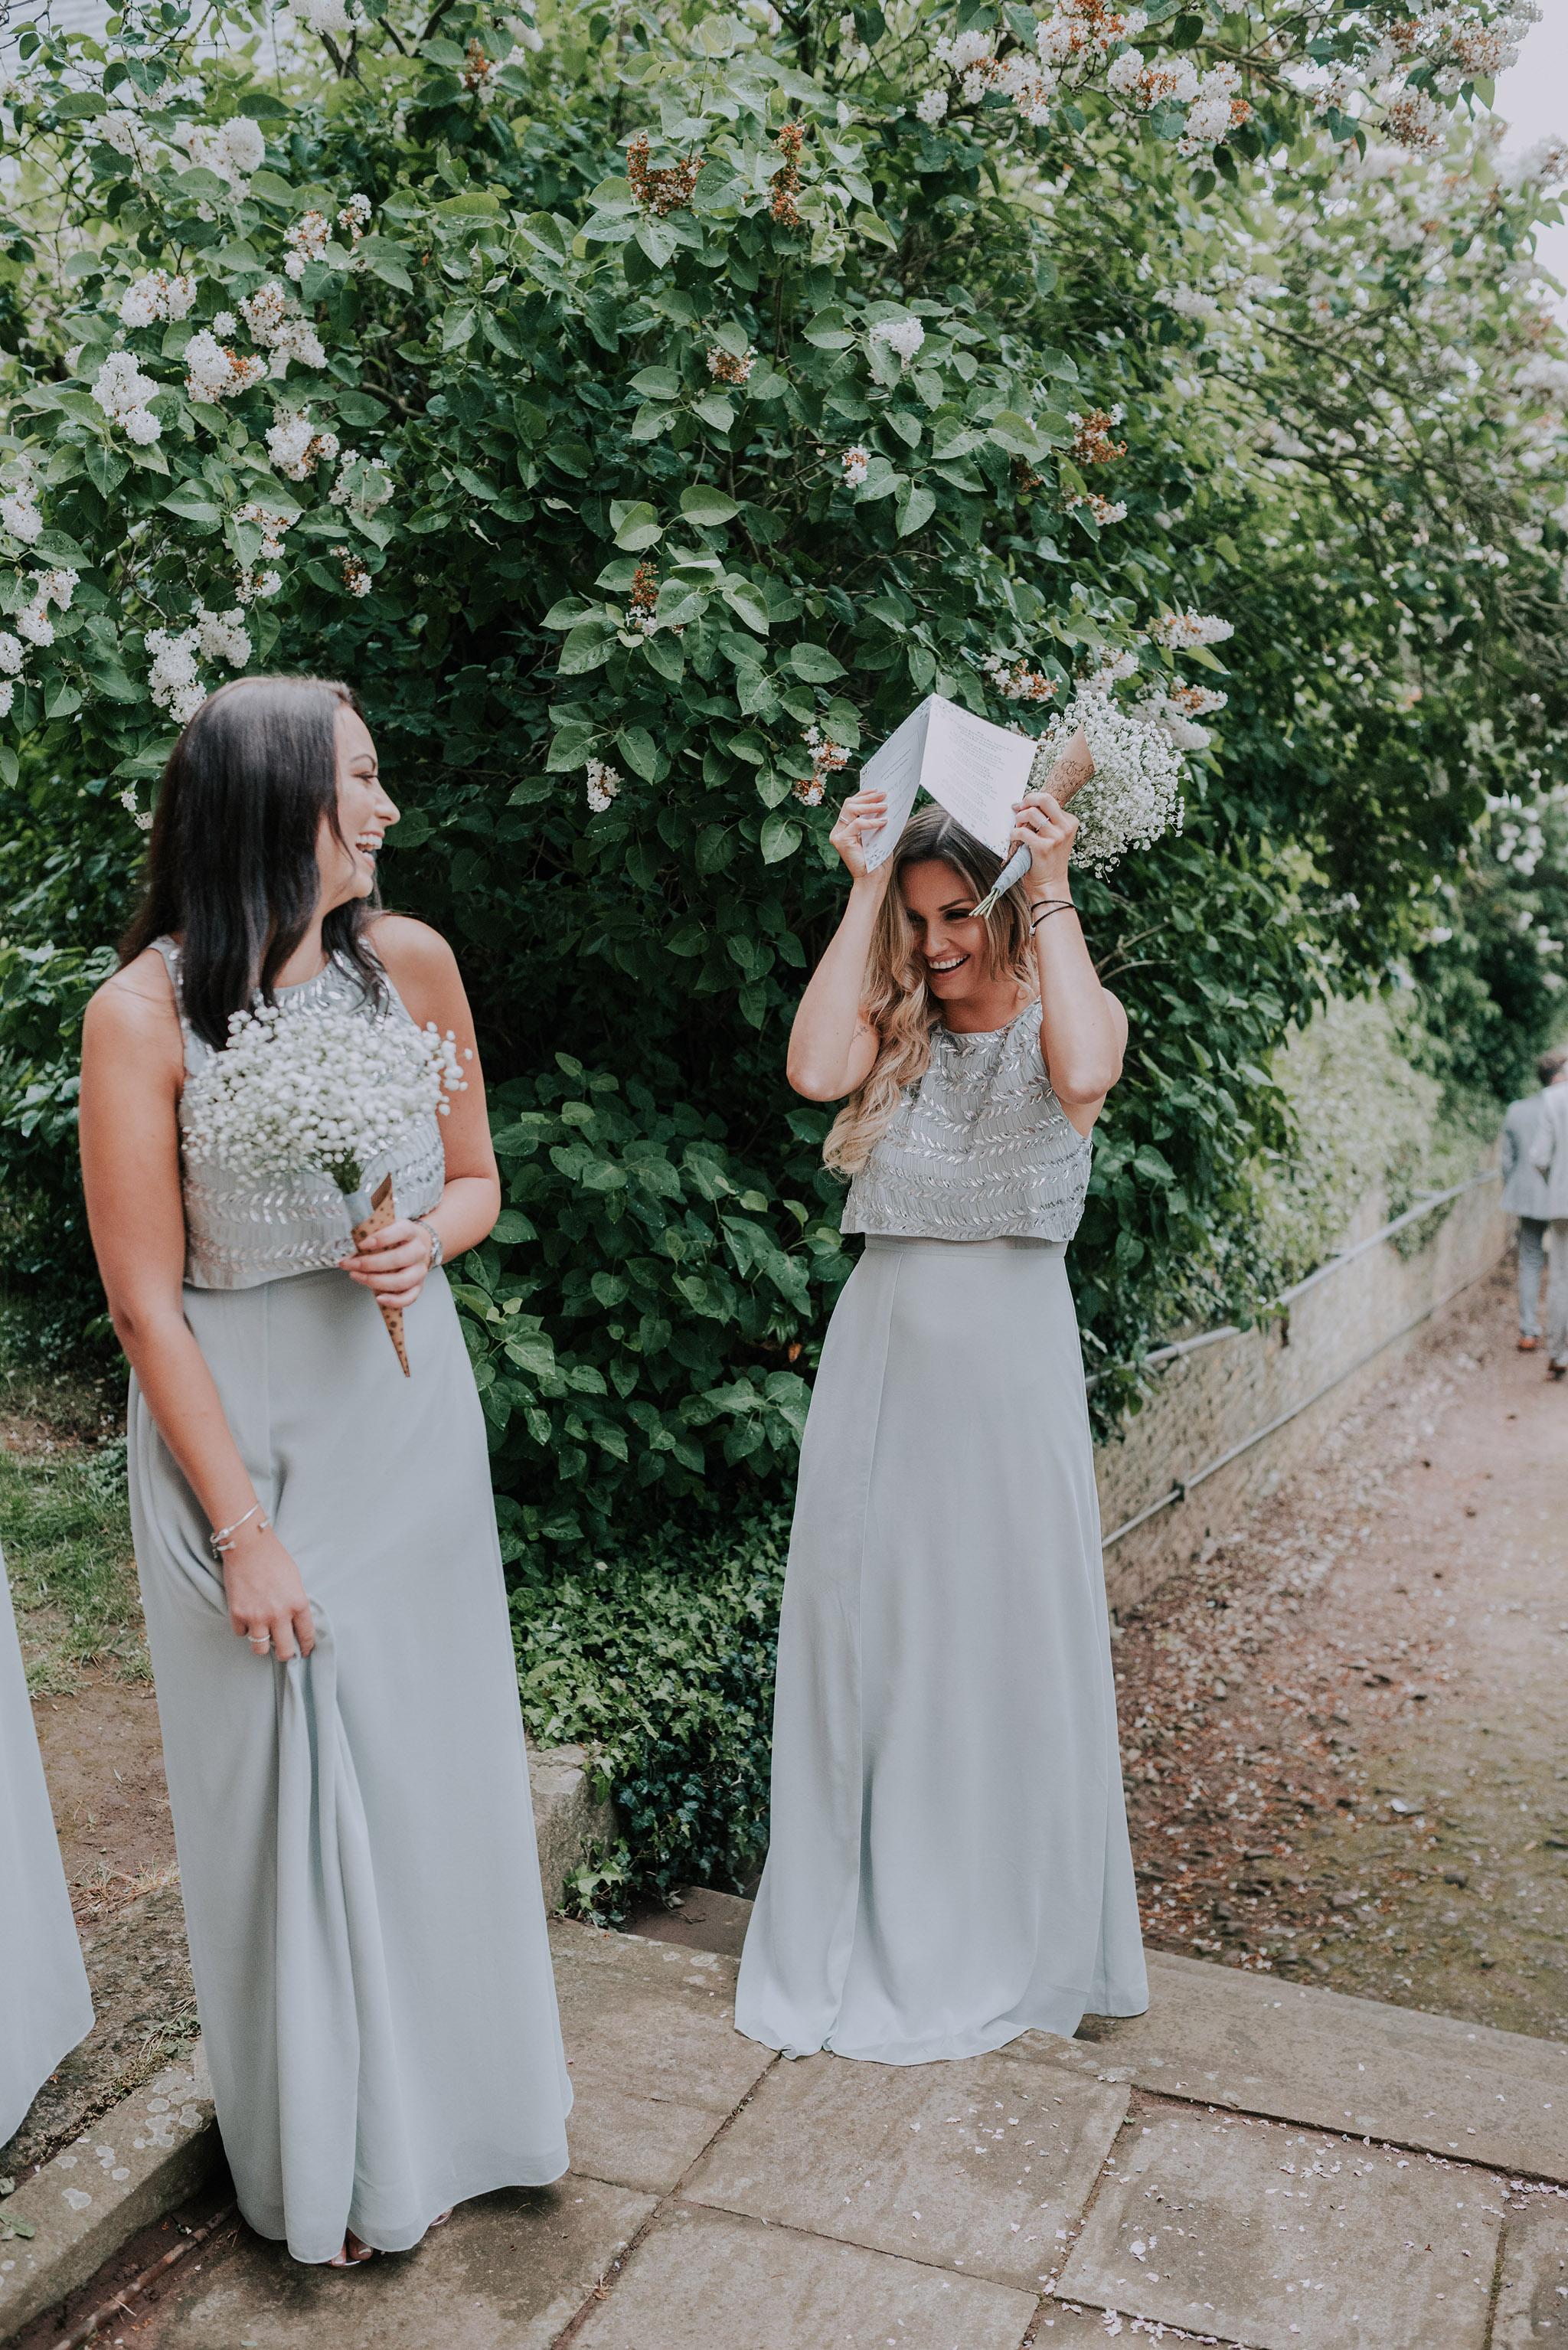 scott-stockwell-photography-wedding-003.jpg